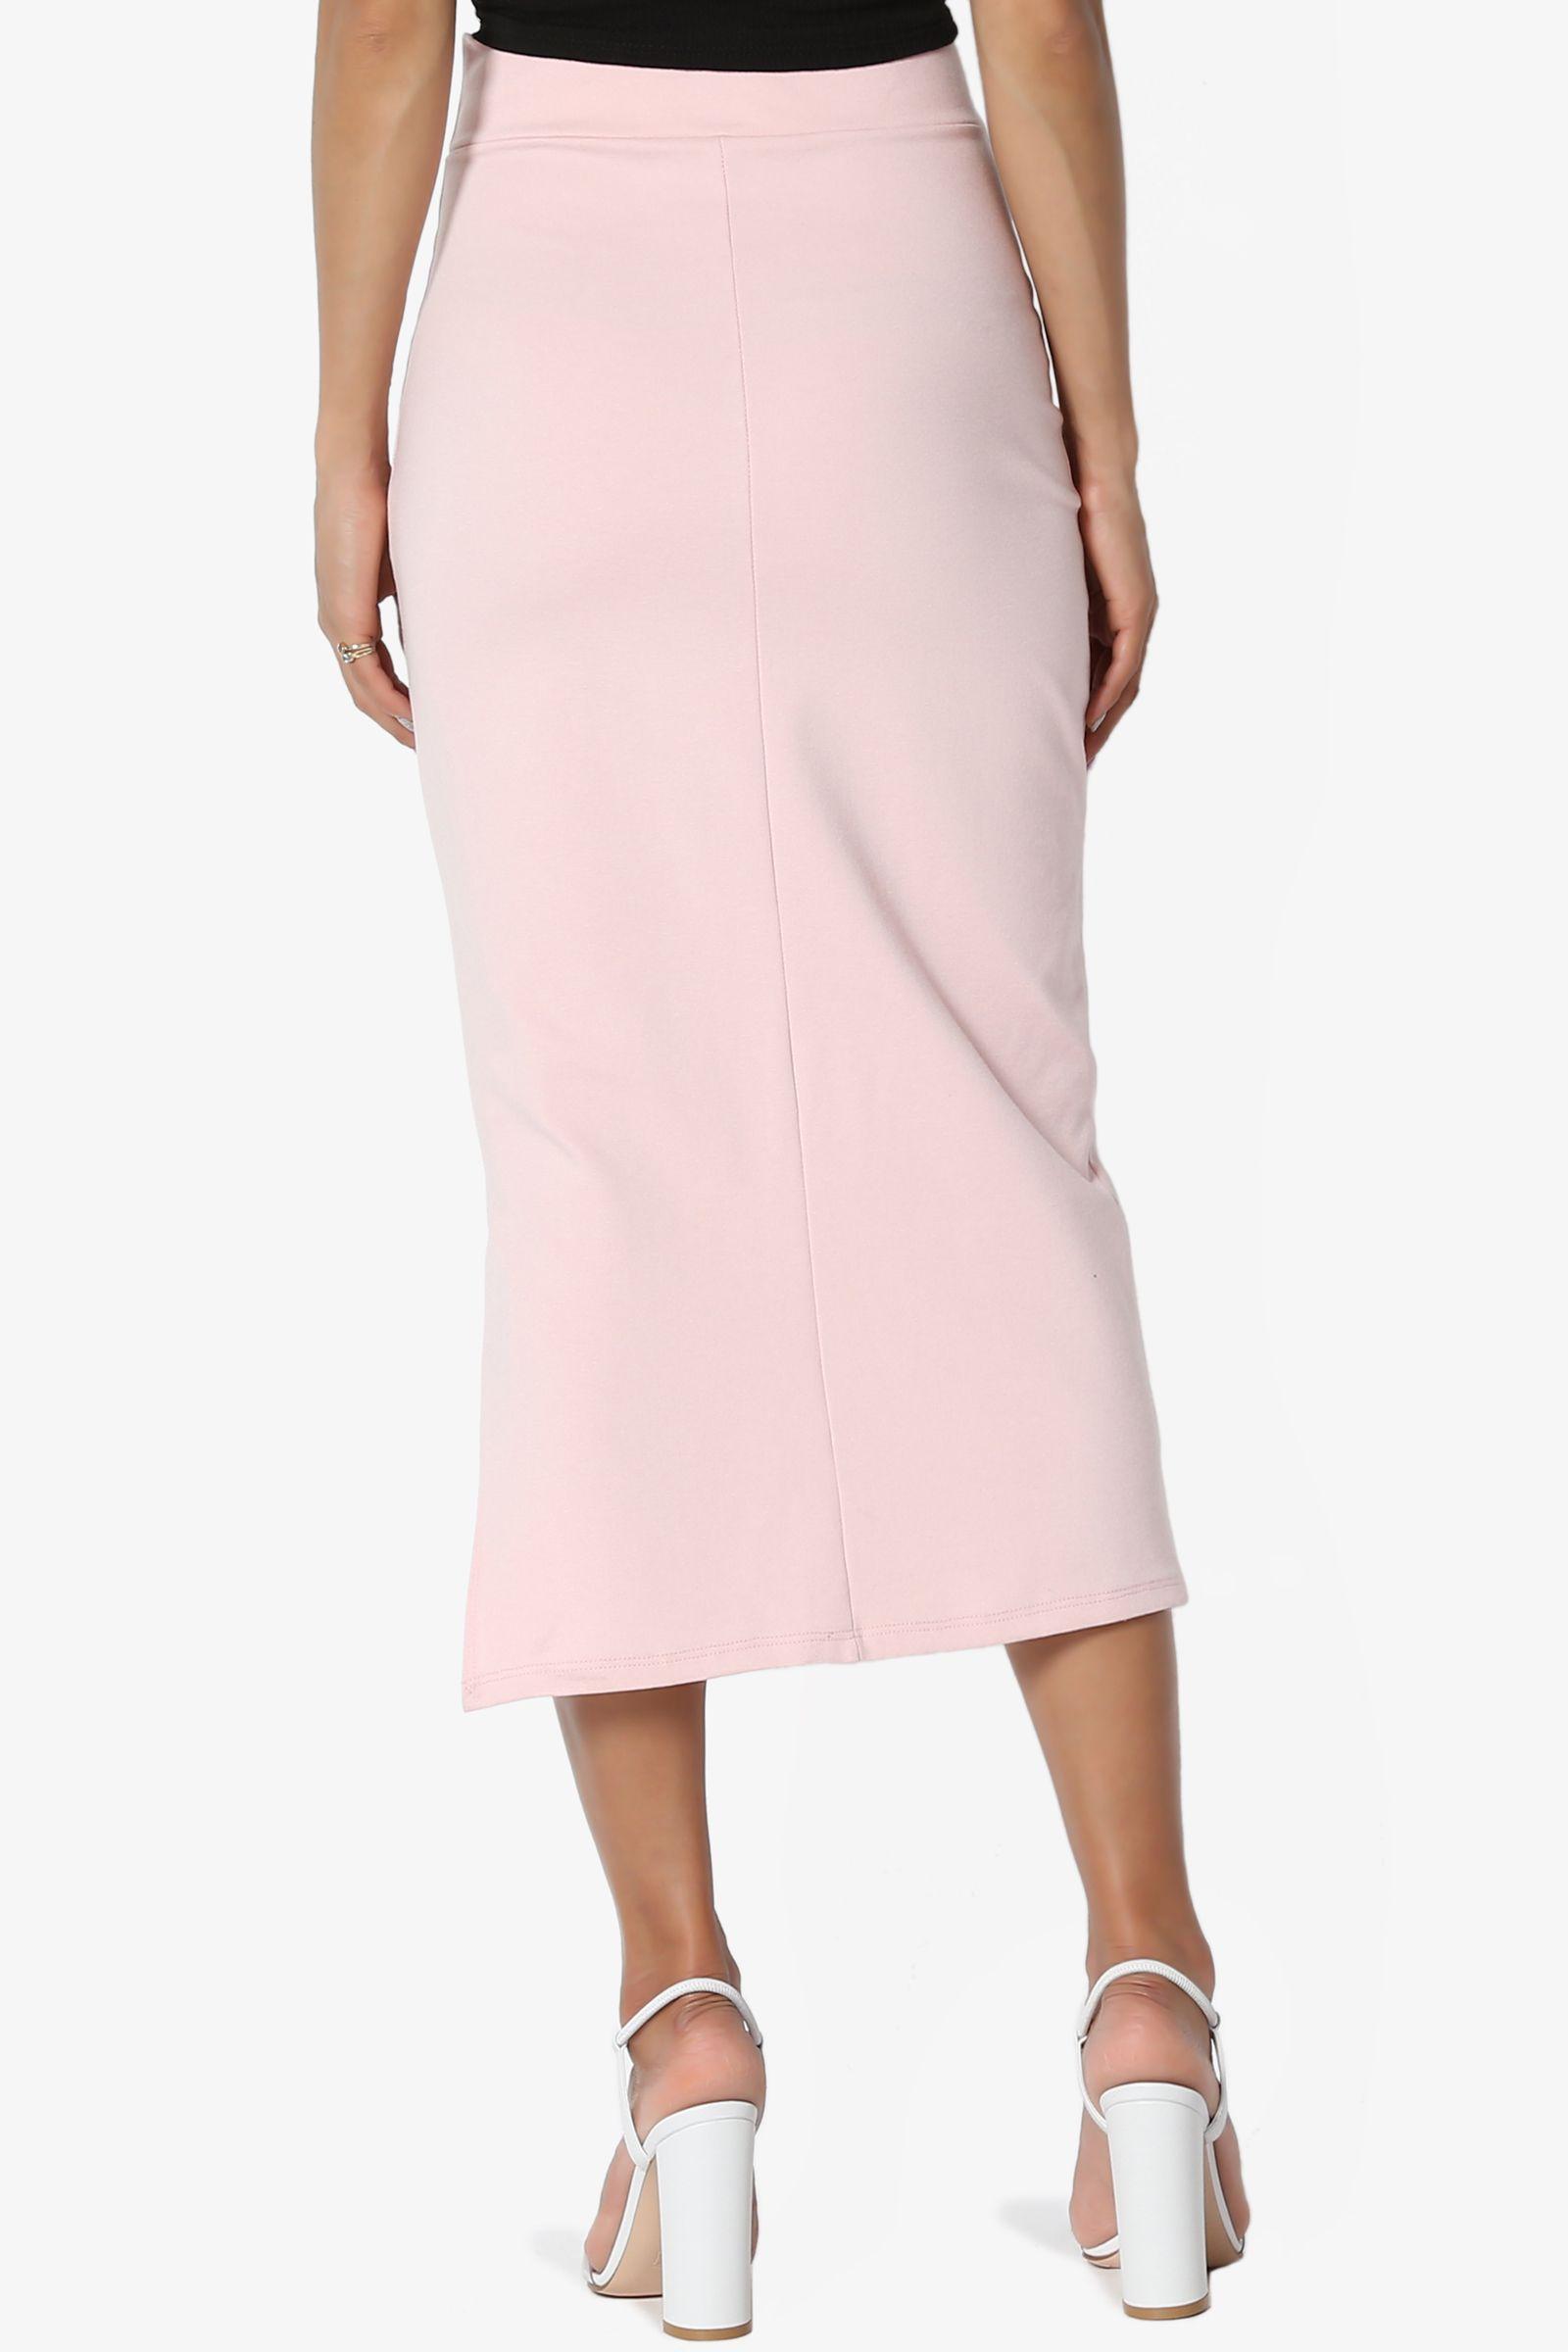 aeb1147bb7 TheMogan Women's S~3X Side Slit Ponte Knit High Waist Mid Calf Long Pencil  Skirt #Ad #Slit, #affiliate, #Ponte, #Knit